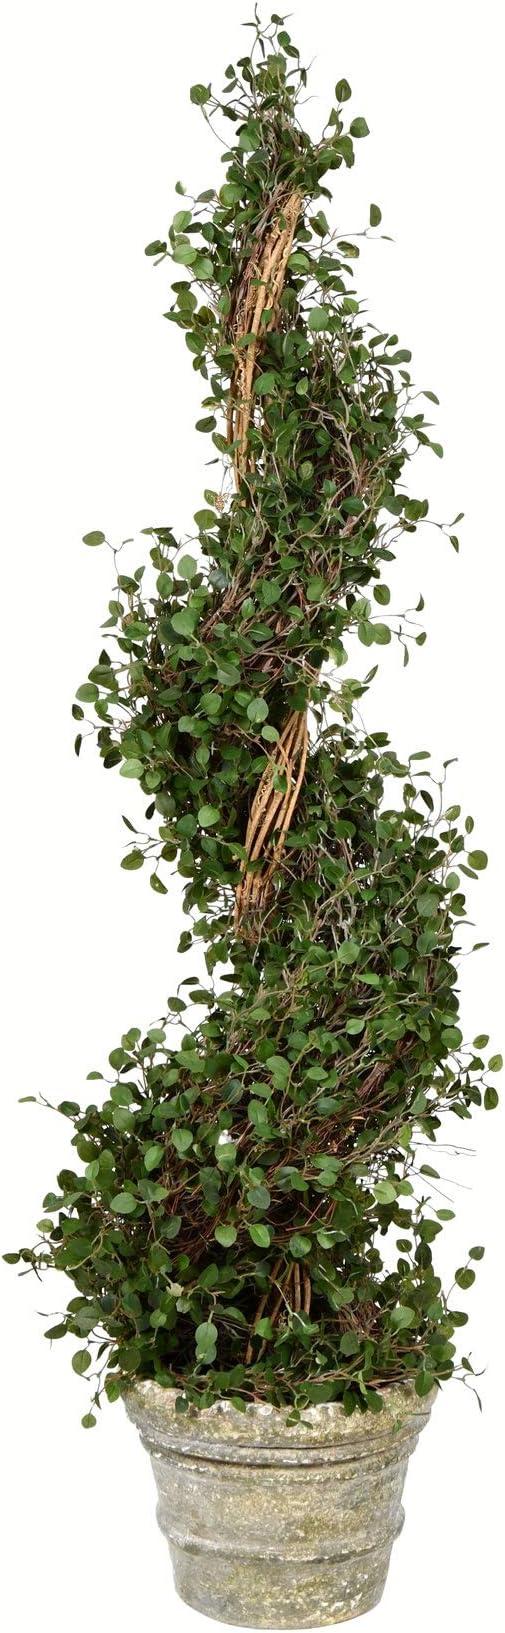 tree vines Unpainted Silicone Prosthetic